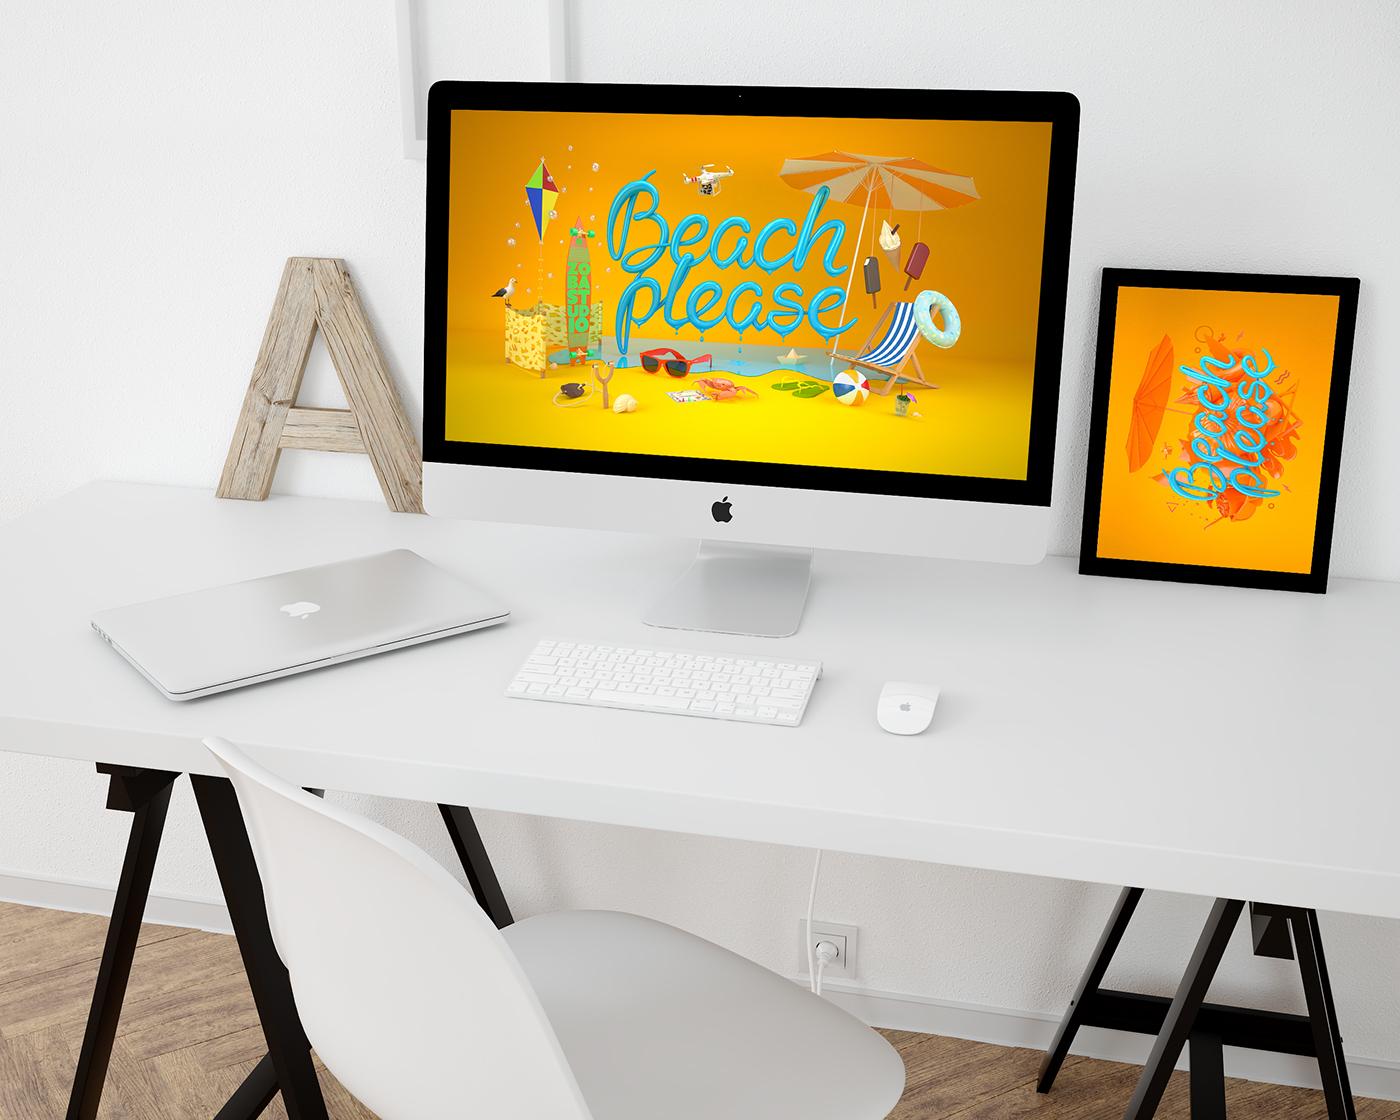 beach please BeachPlease bartosz morawski zobastudio bartoszmorawski zoba studio 3D set design key visual poster warm colorful color